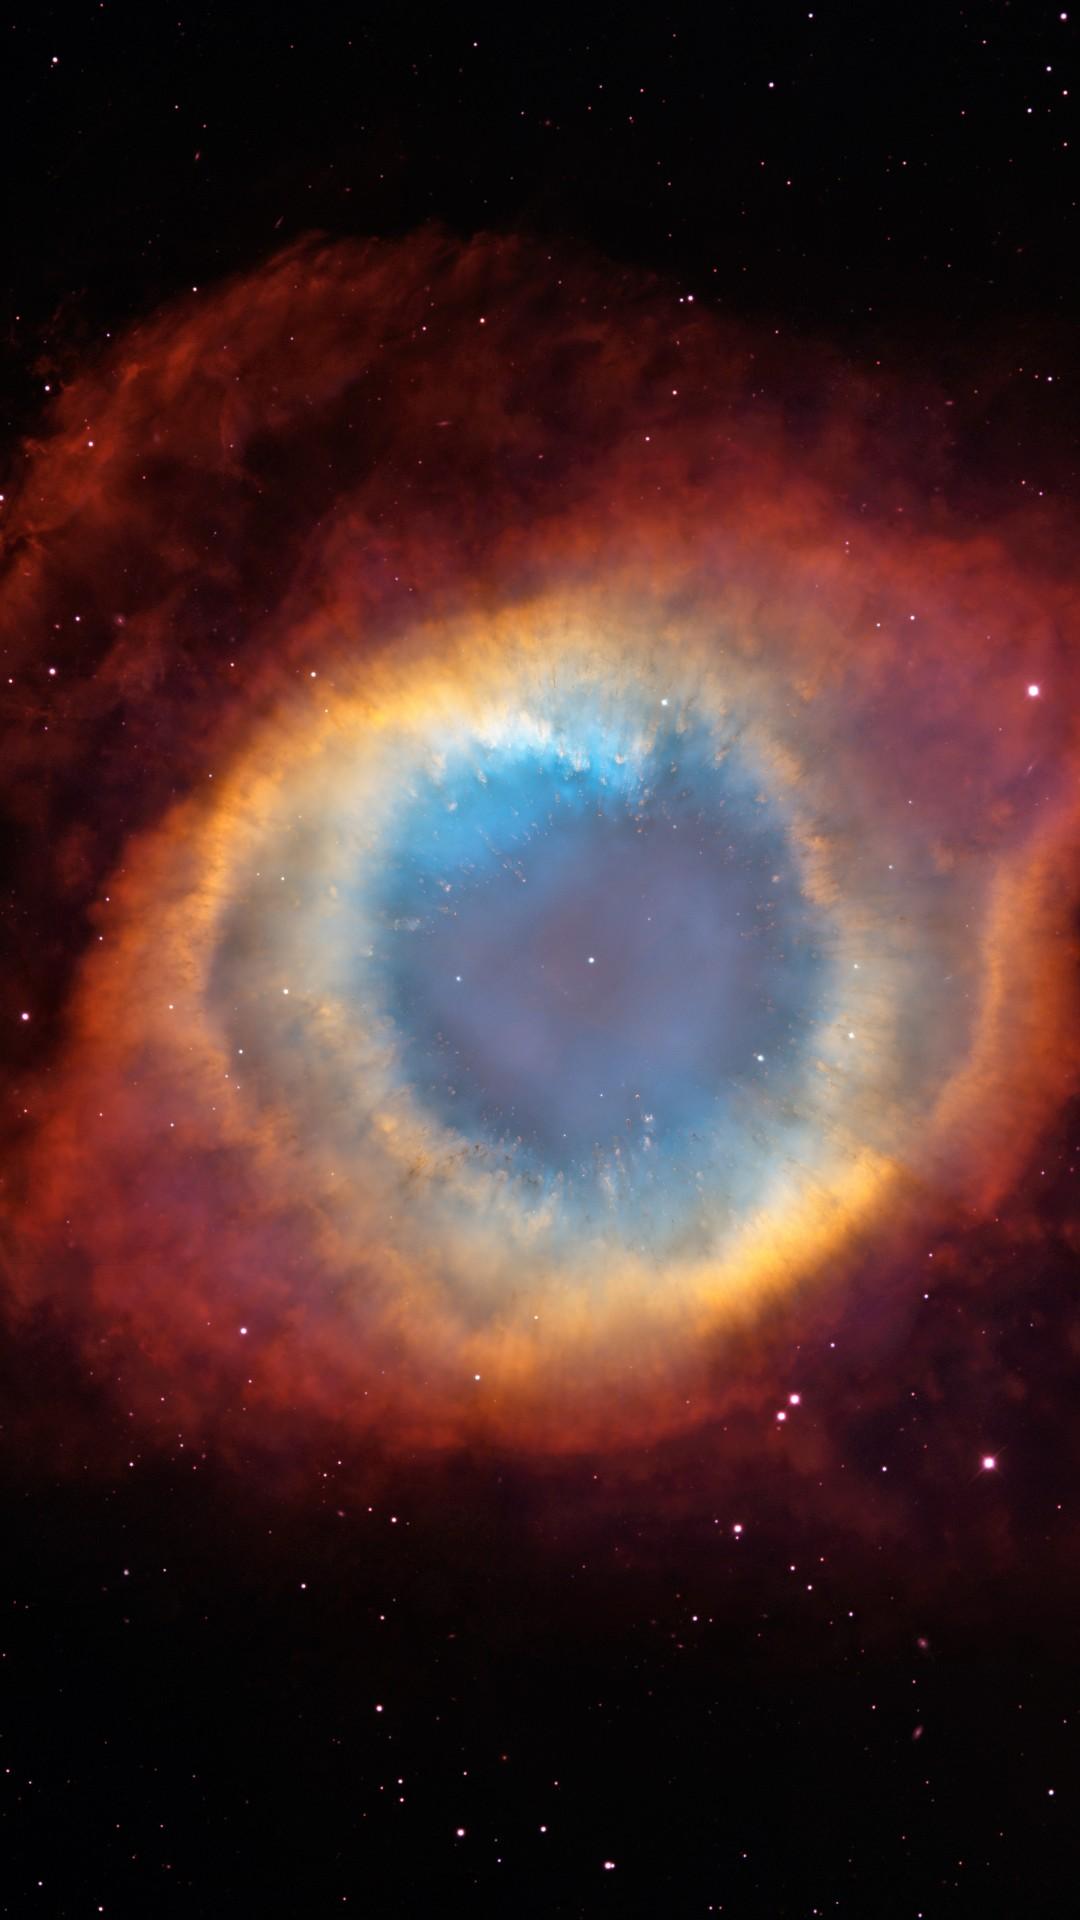 Eye Of God Nebula 1080x1920 Wallpaper Teahub Io